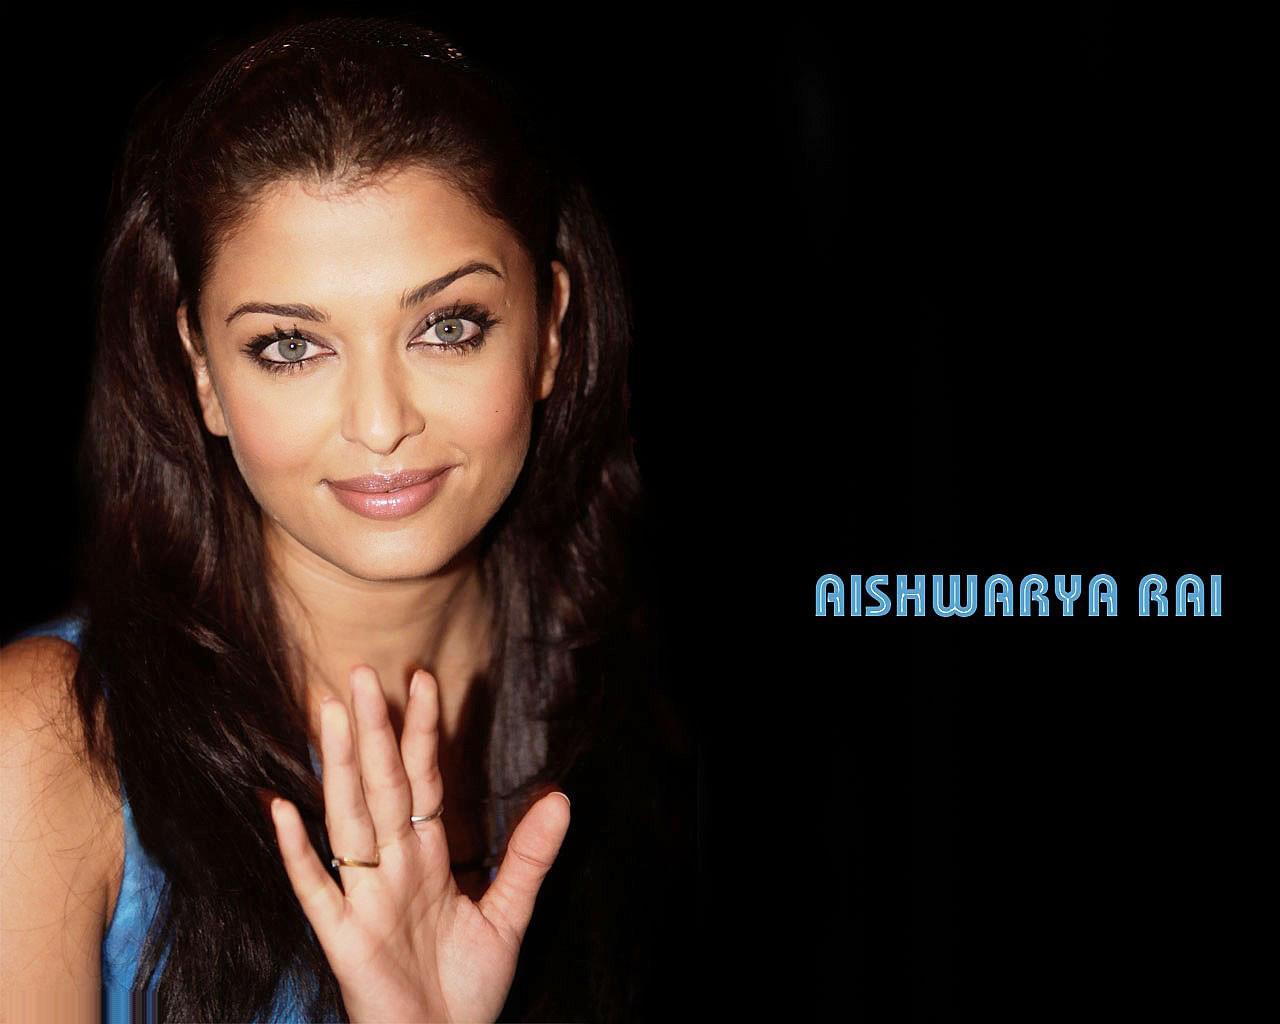 Aishwarya Rai Hd Wallpaper Download: Free Download HD Wallpapers